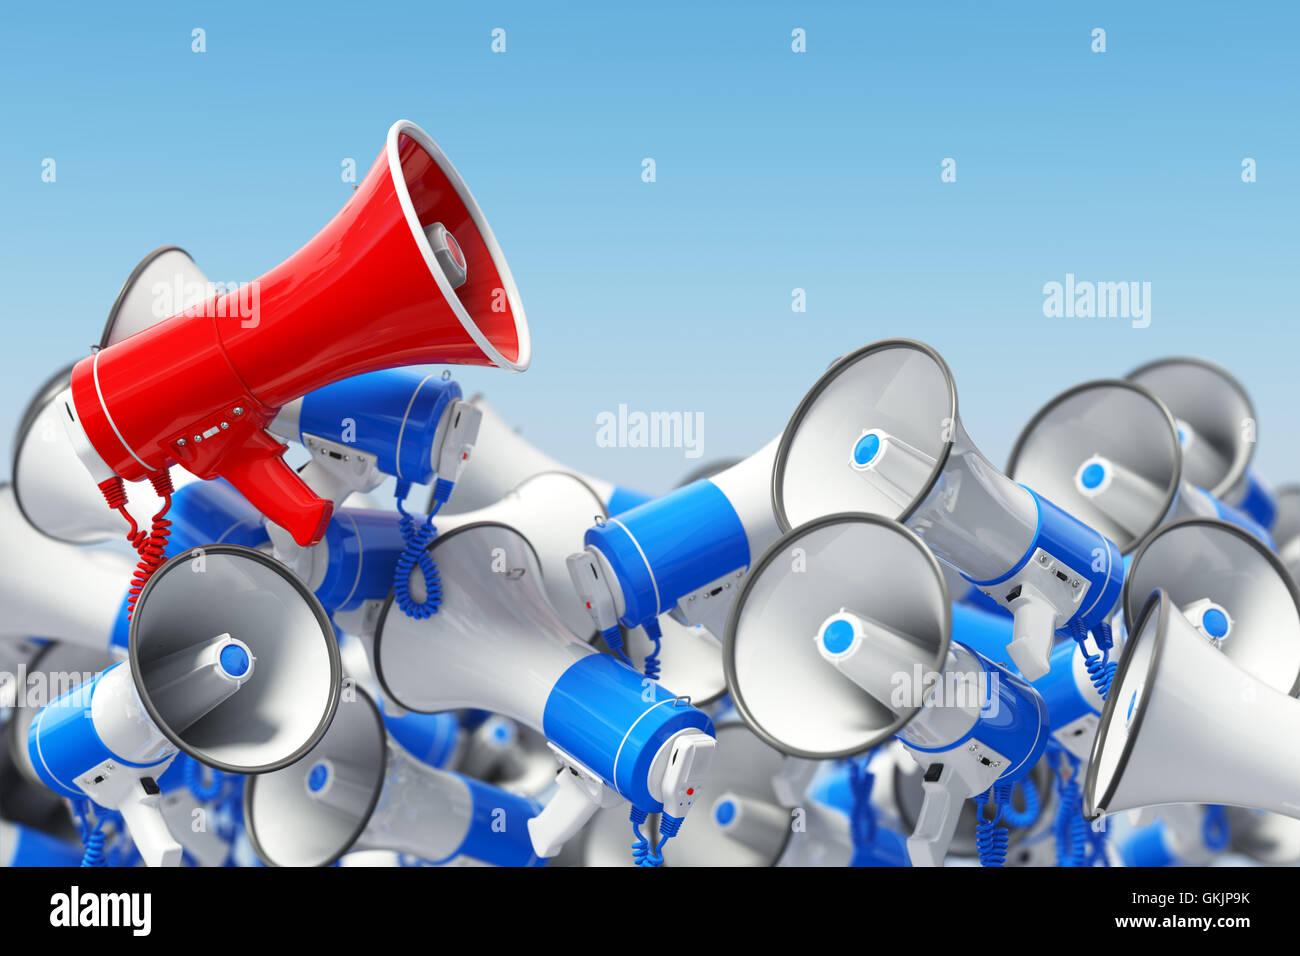 Megaphones. Promotion and advertising, digital marketing or social network. Leader of protest or revolution  concept. - Stock Image